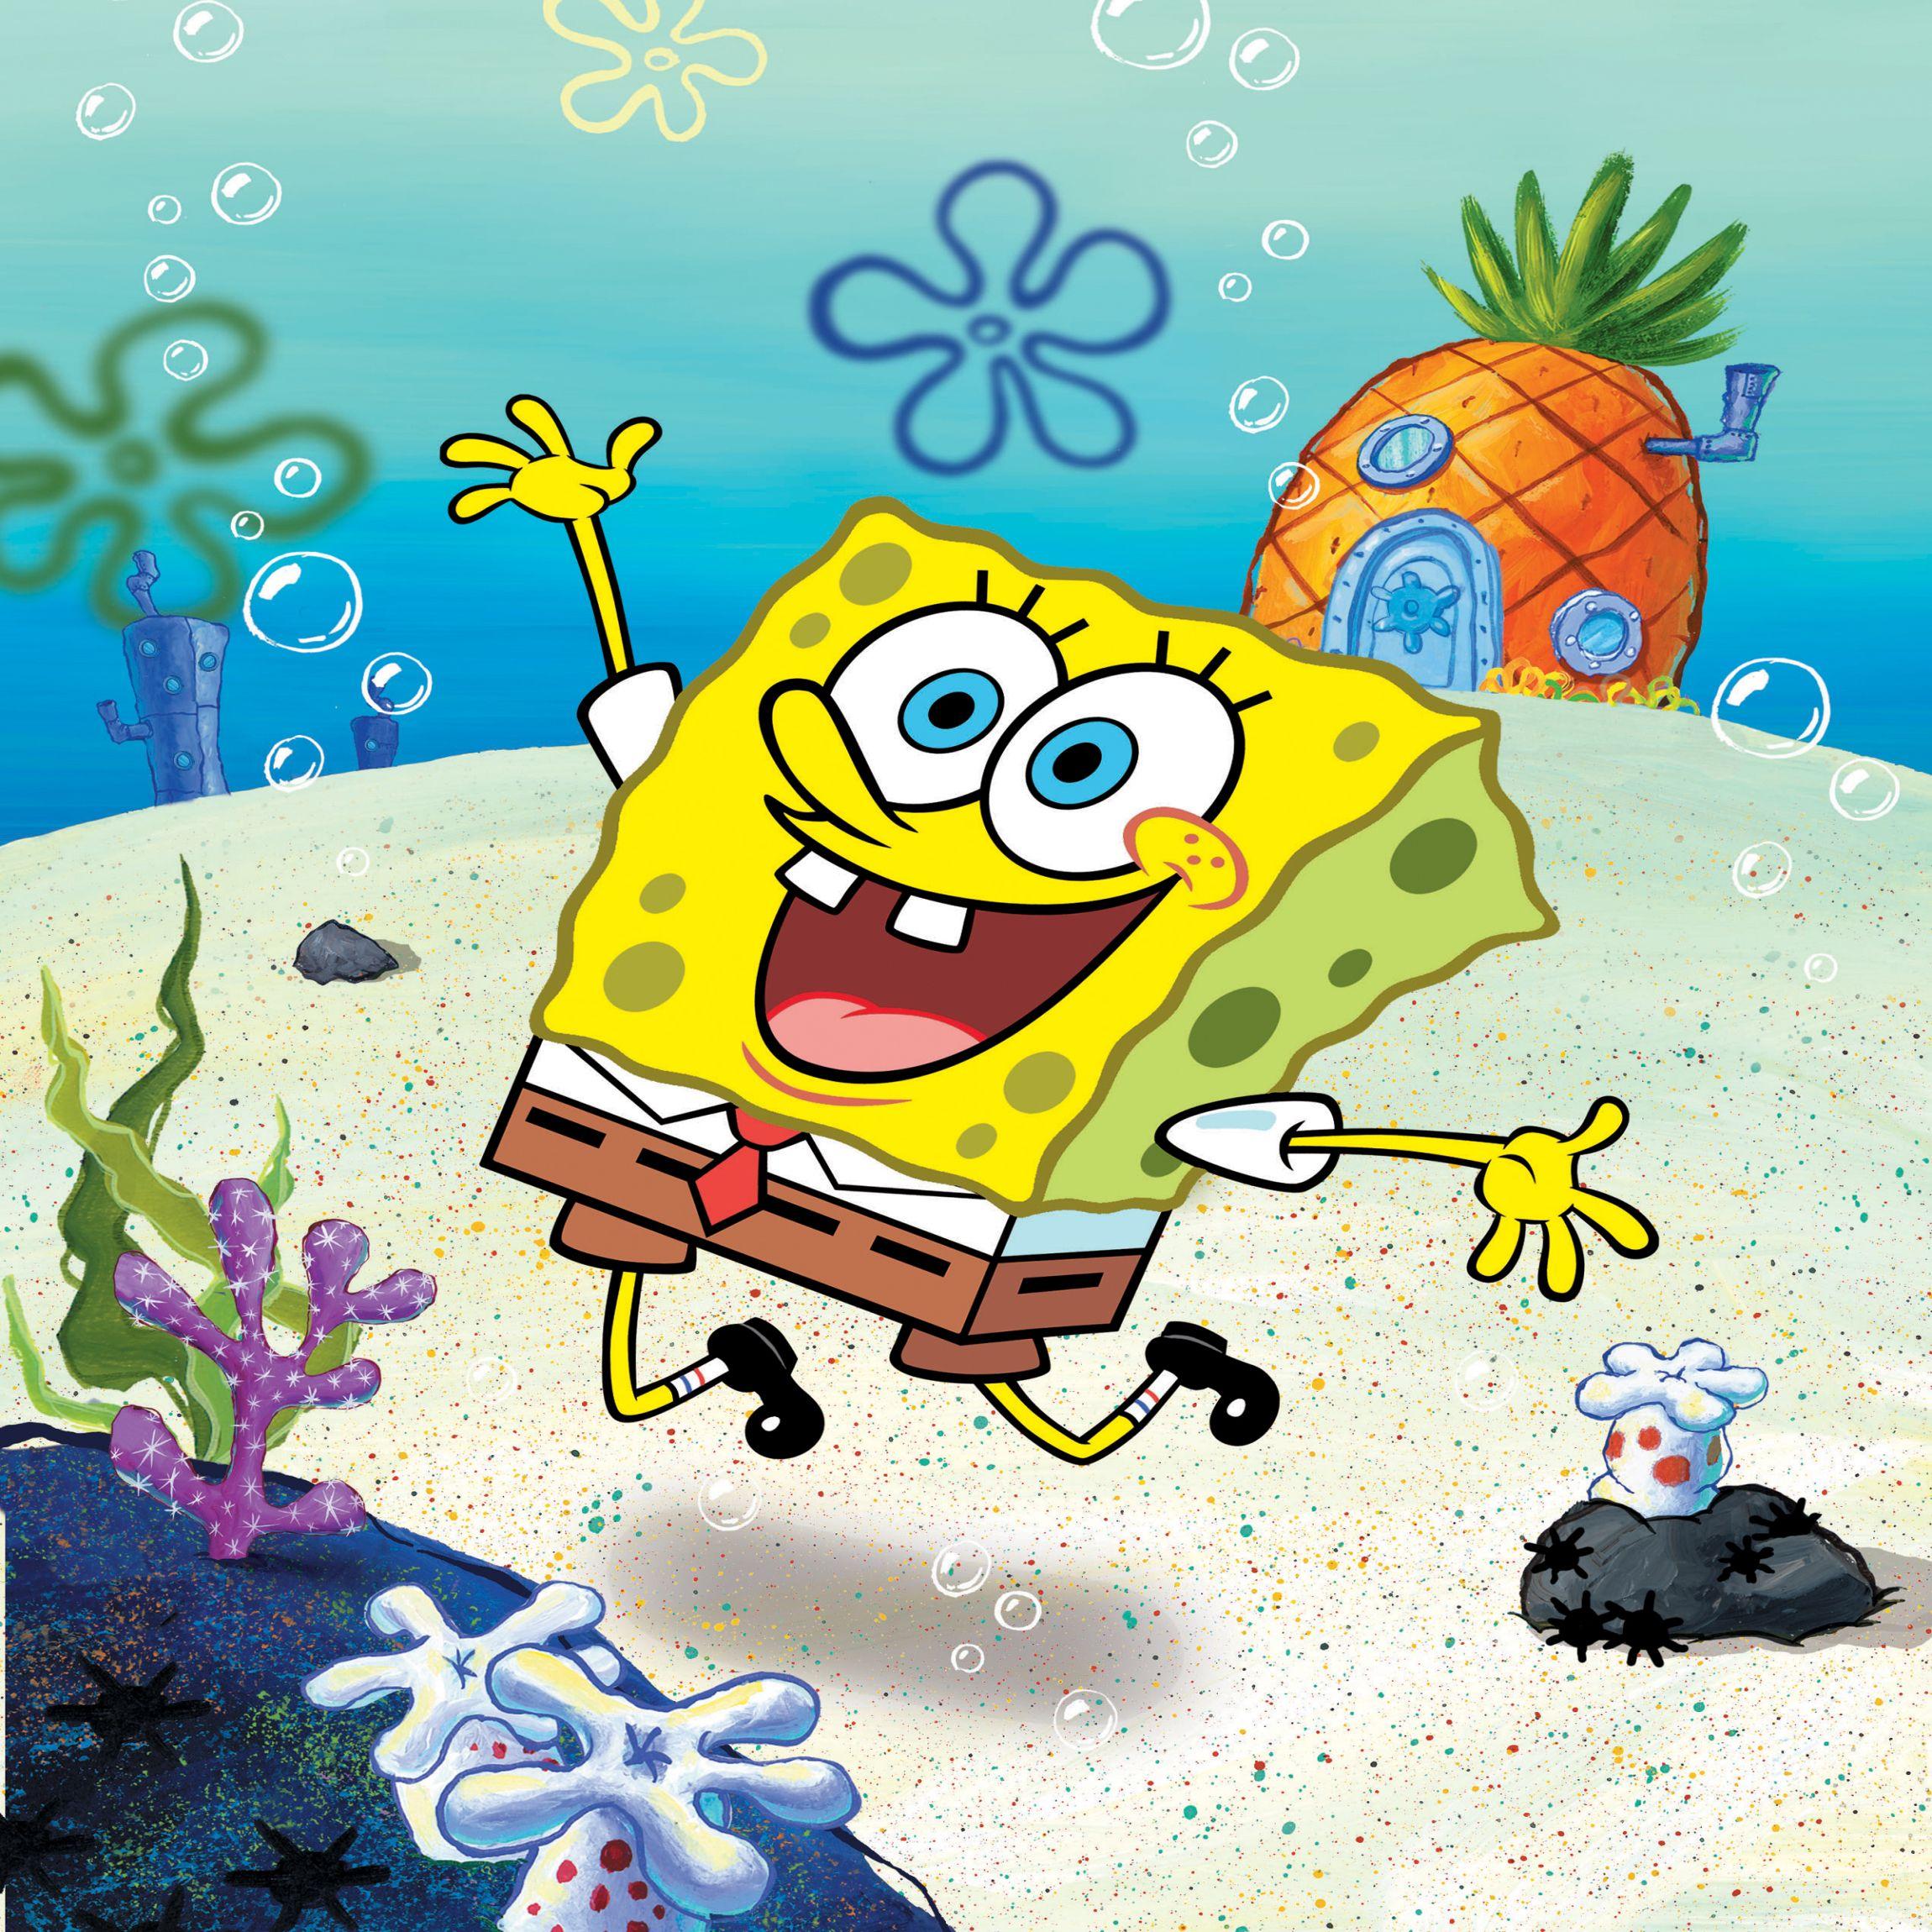 Spongebob Squarepants Explained Why The Series Remains Popular